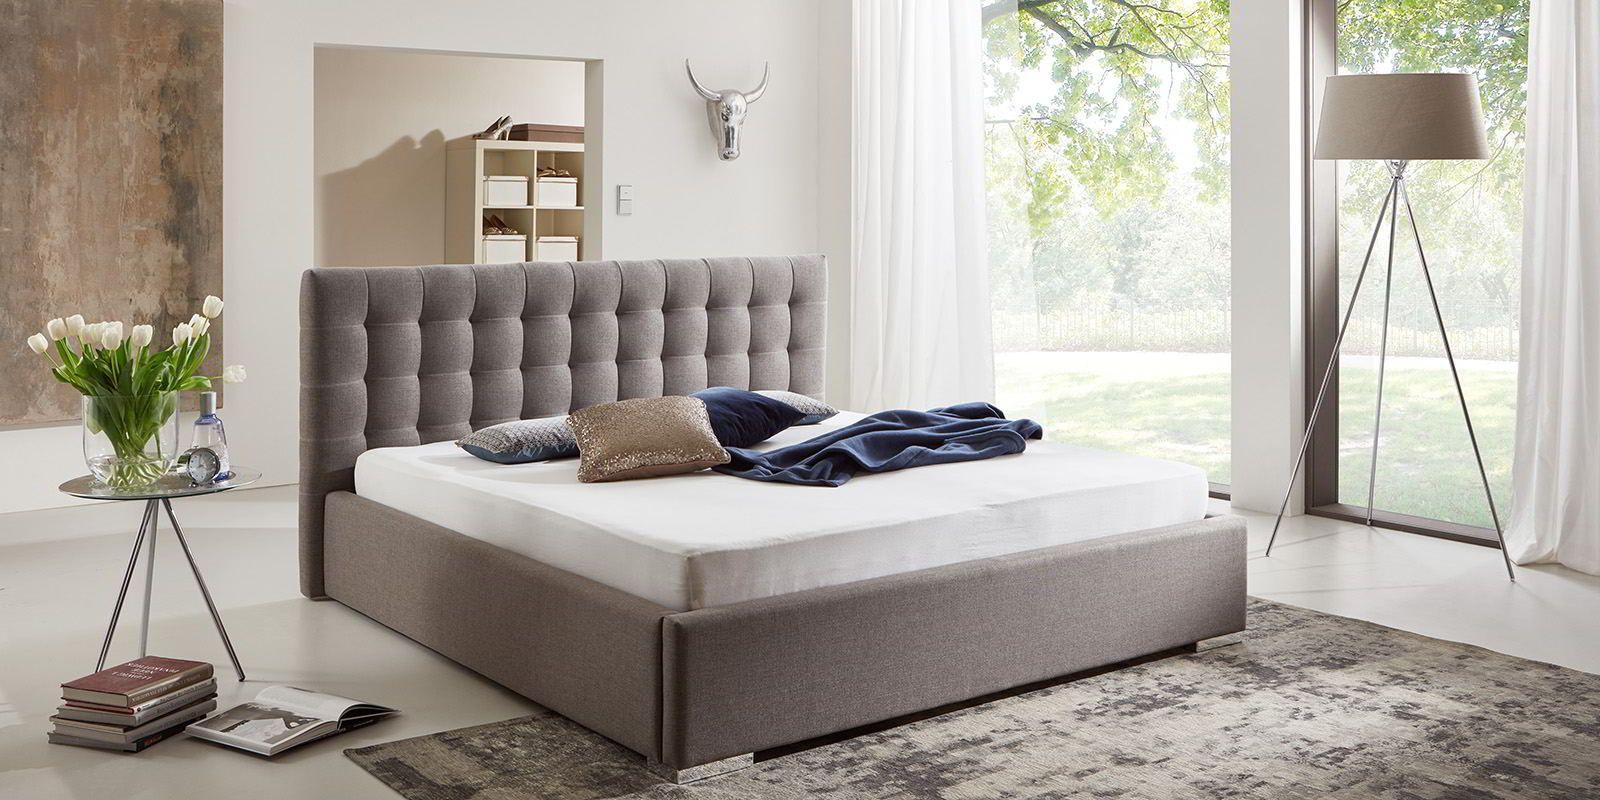 Bett Mit Bettkasten Jimmy Webstoff Bett Mit Bettkasten Bett